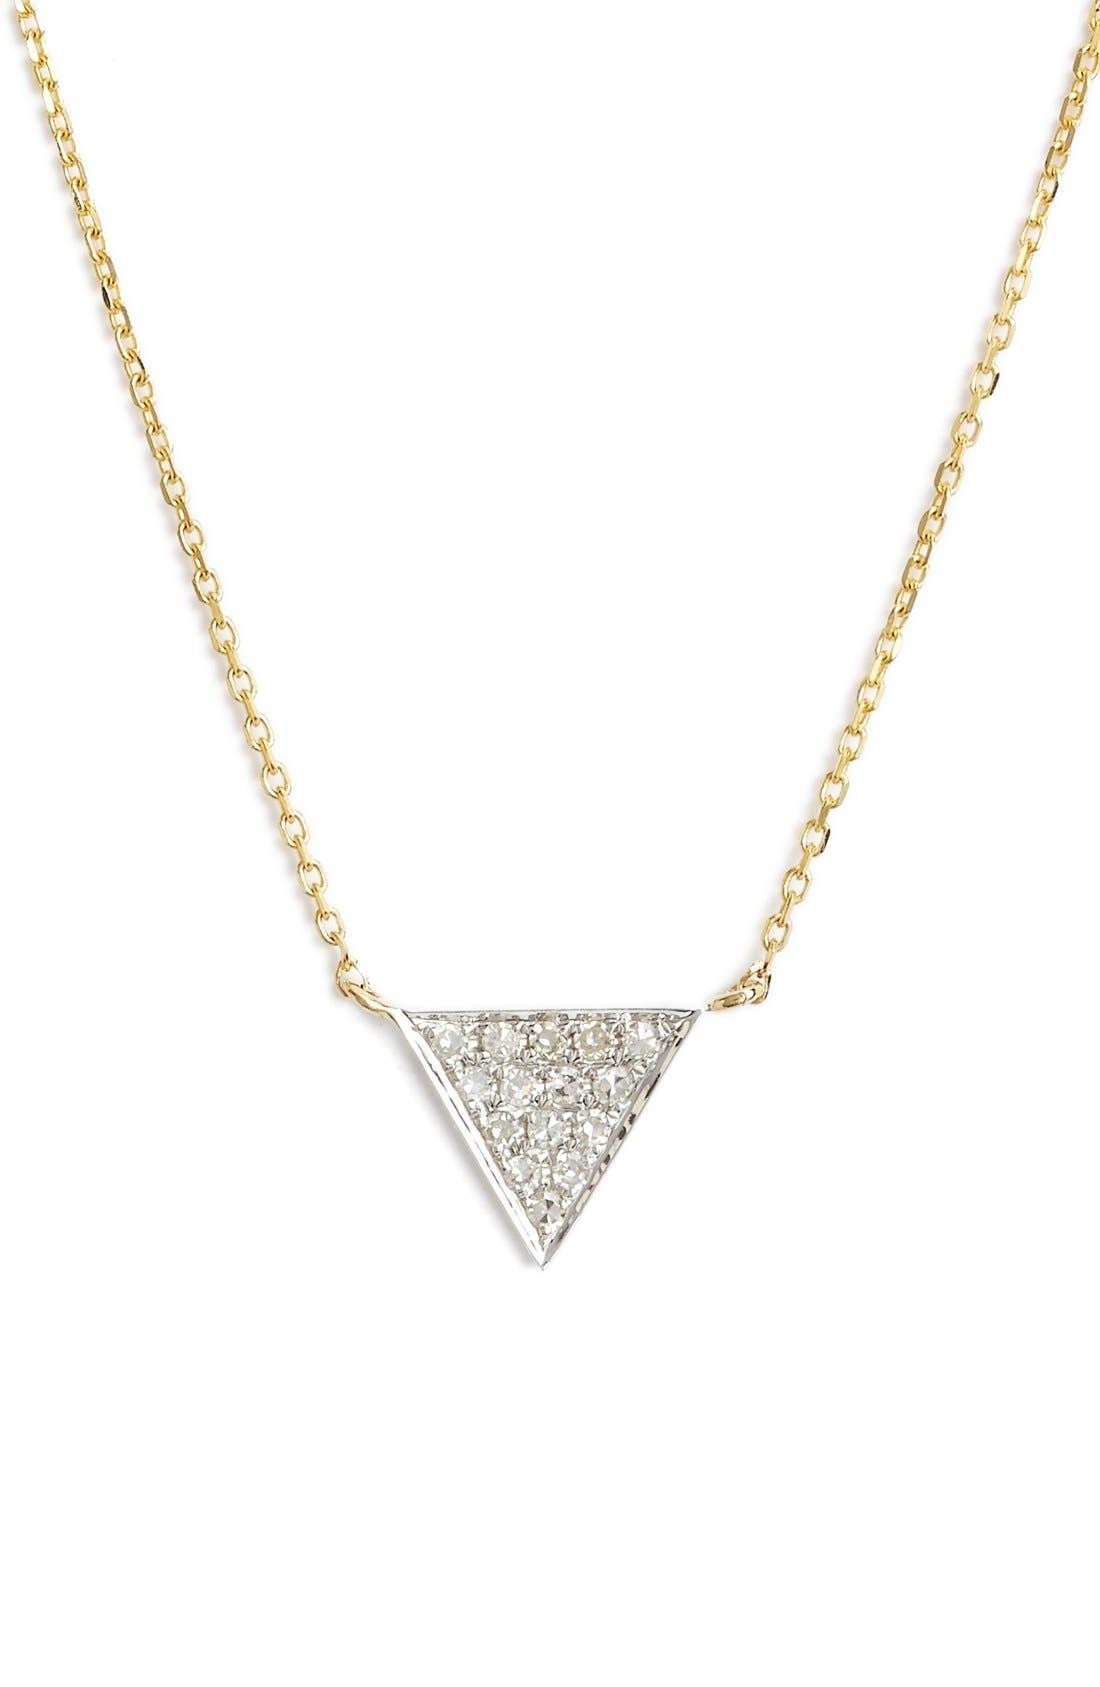 'Emily Sarah' Diamond Triangle Pendant Necklace,                             Main thumbnail 1, color,                             YELLOW GOLD